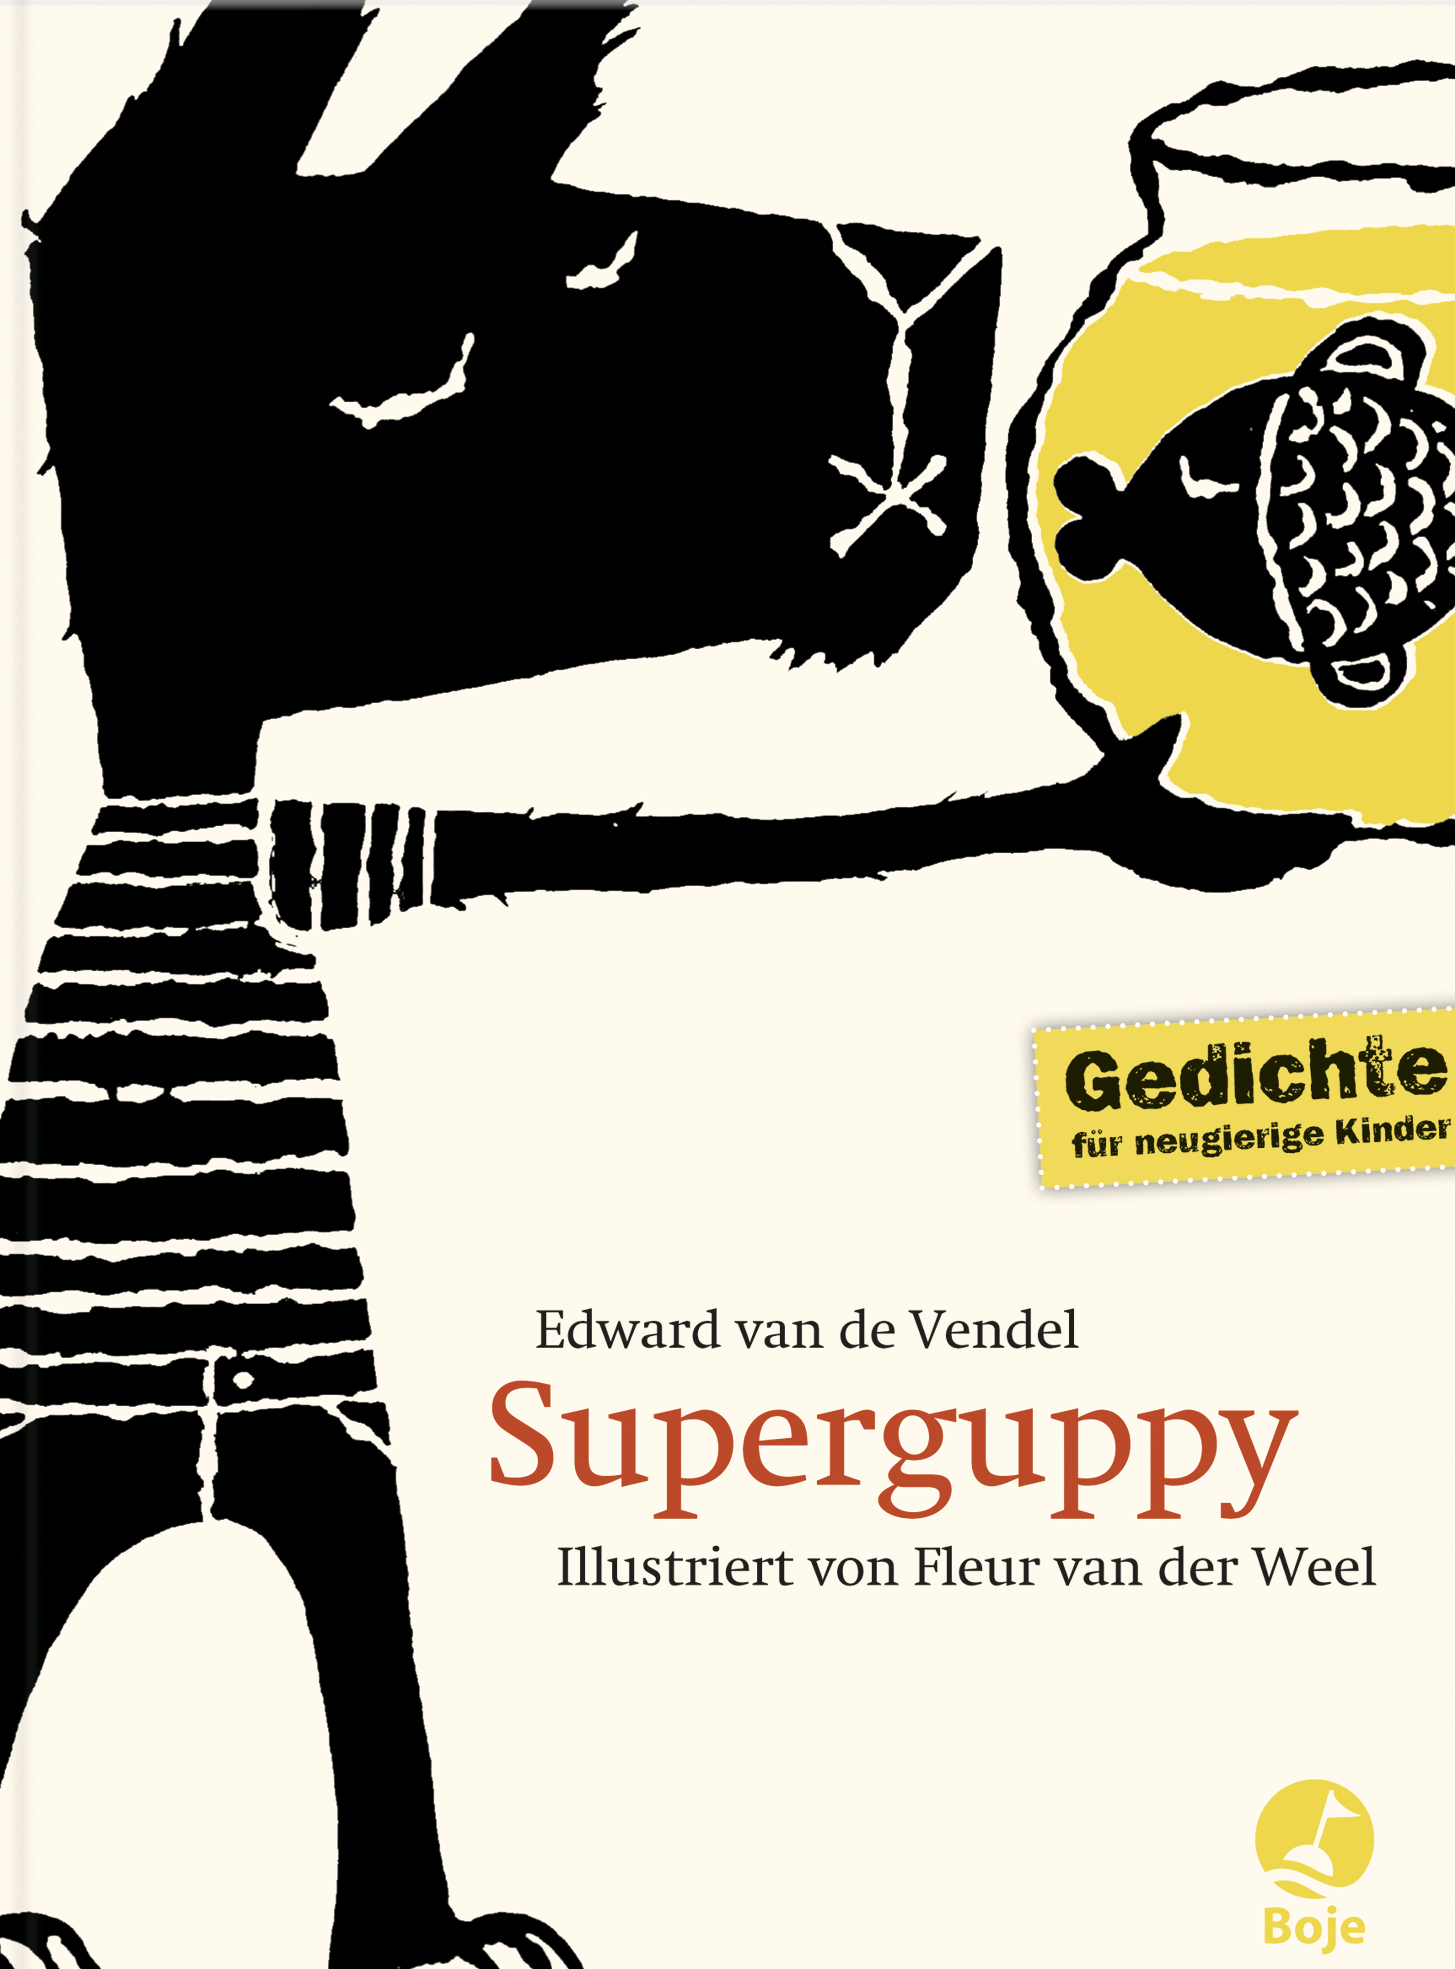 Superguppy (Boje) Edward van de Vendel